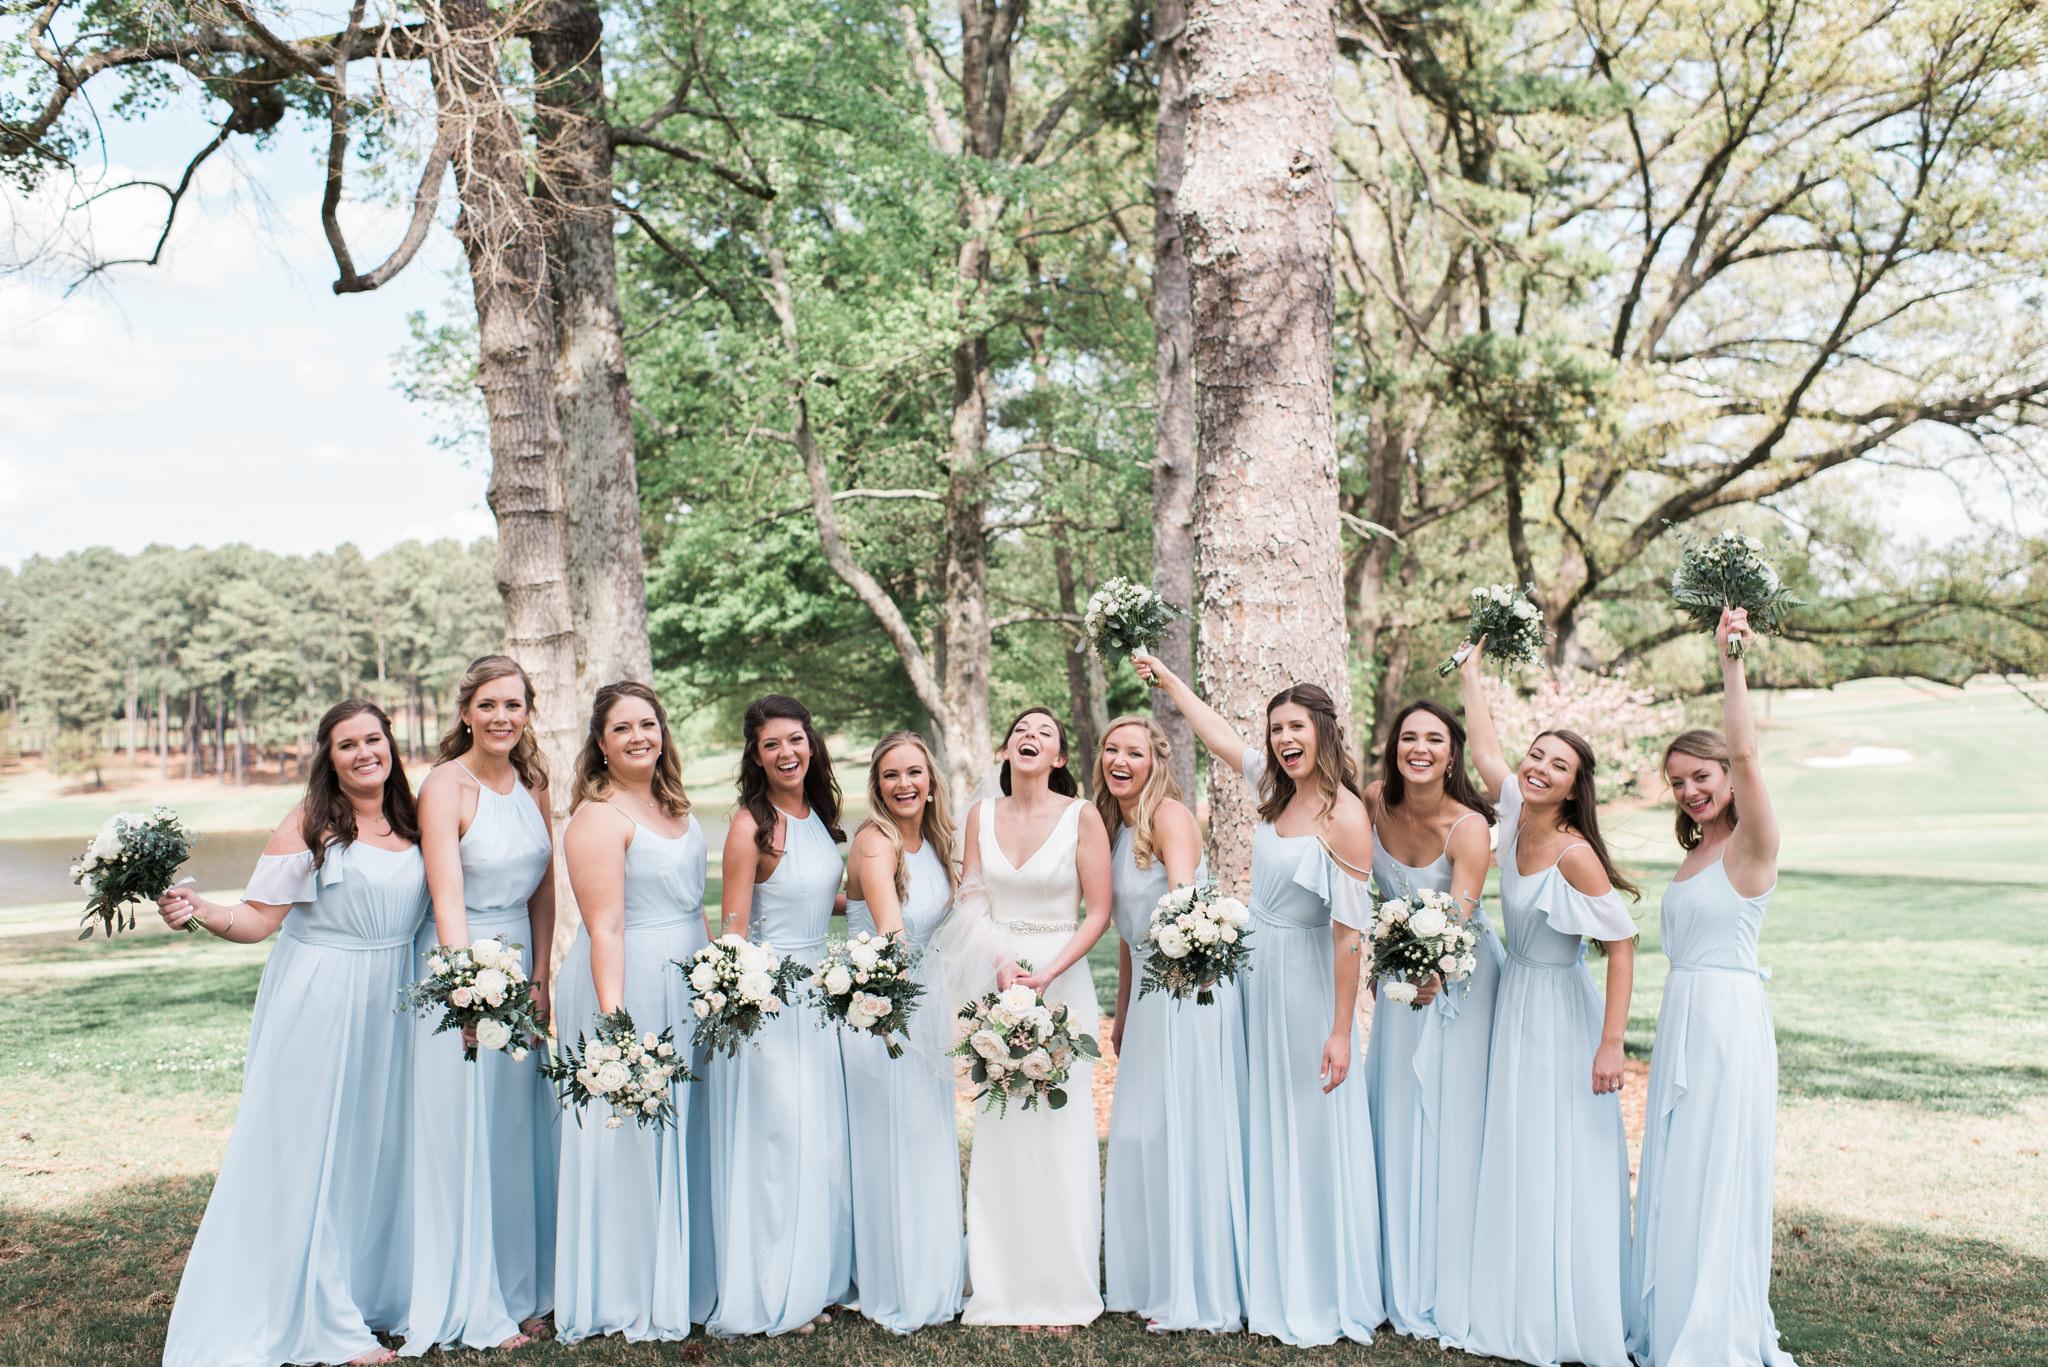 Athens-wedding-bridal-party-41.jpg